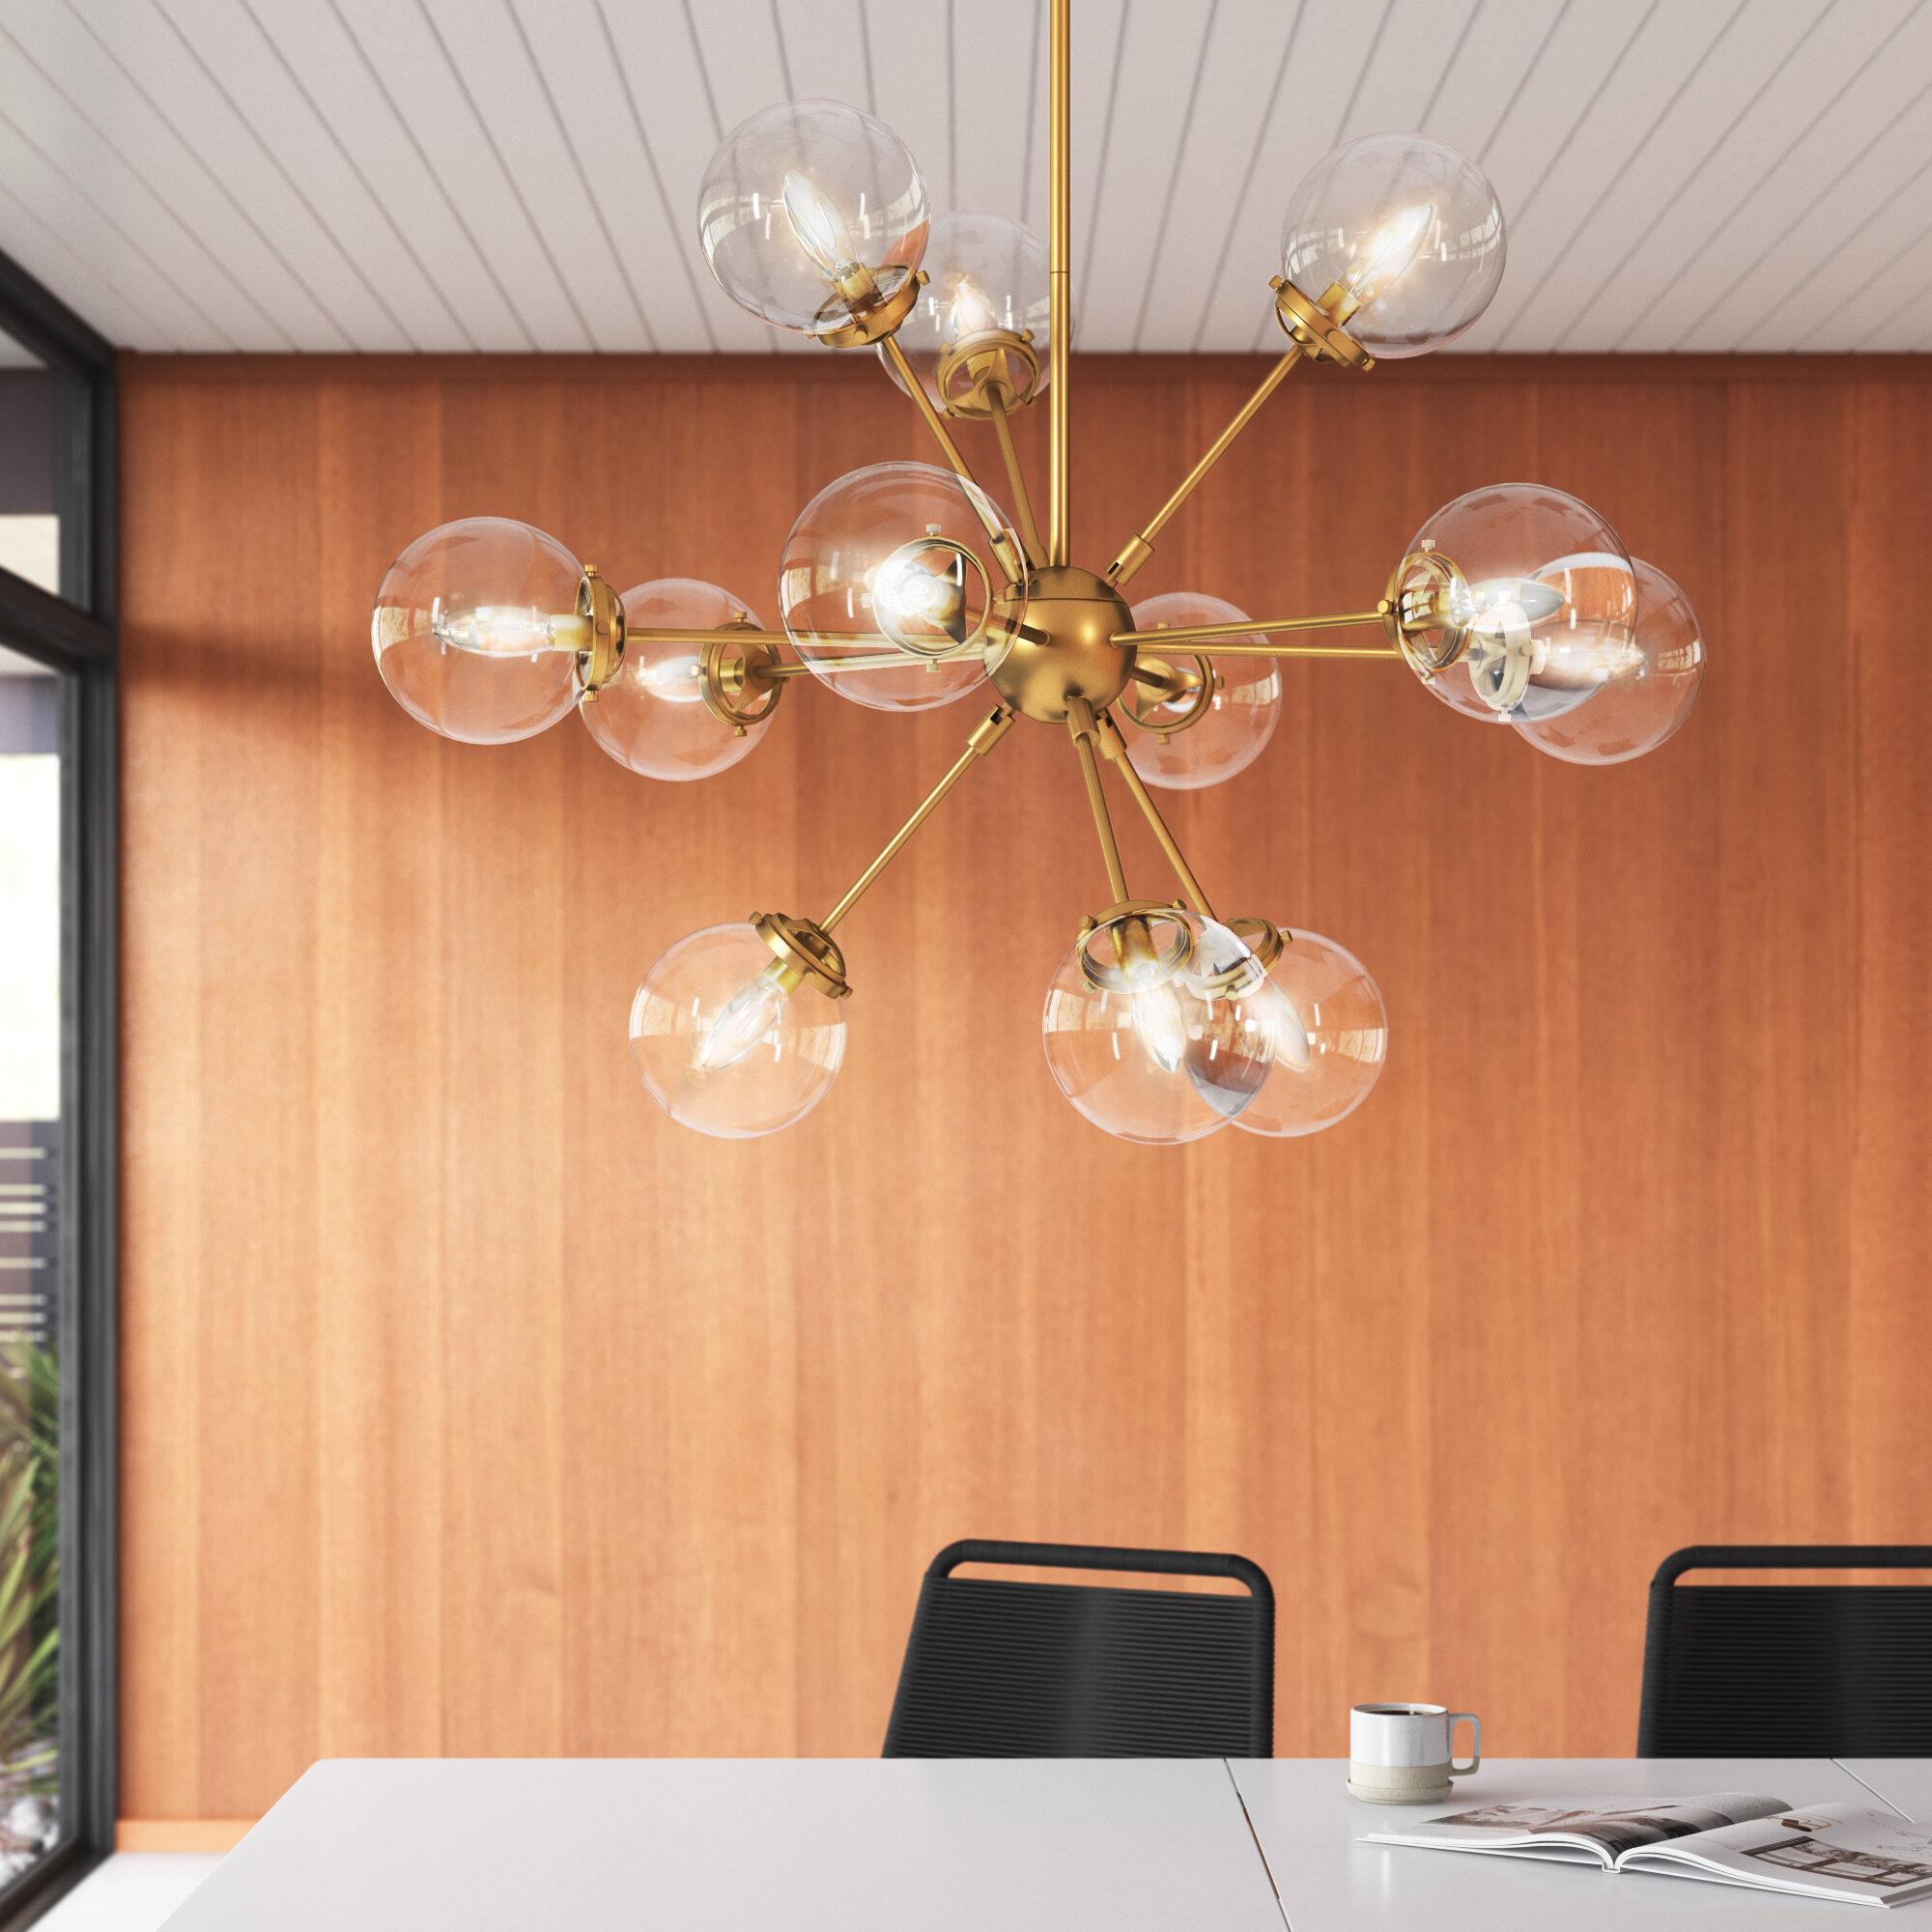 Allmodern 12 Light Sputnik Sphere Chandelier Reviews Wayfair